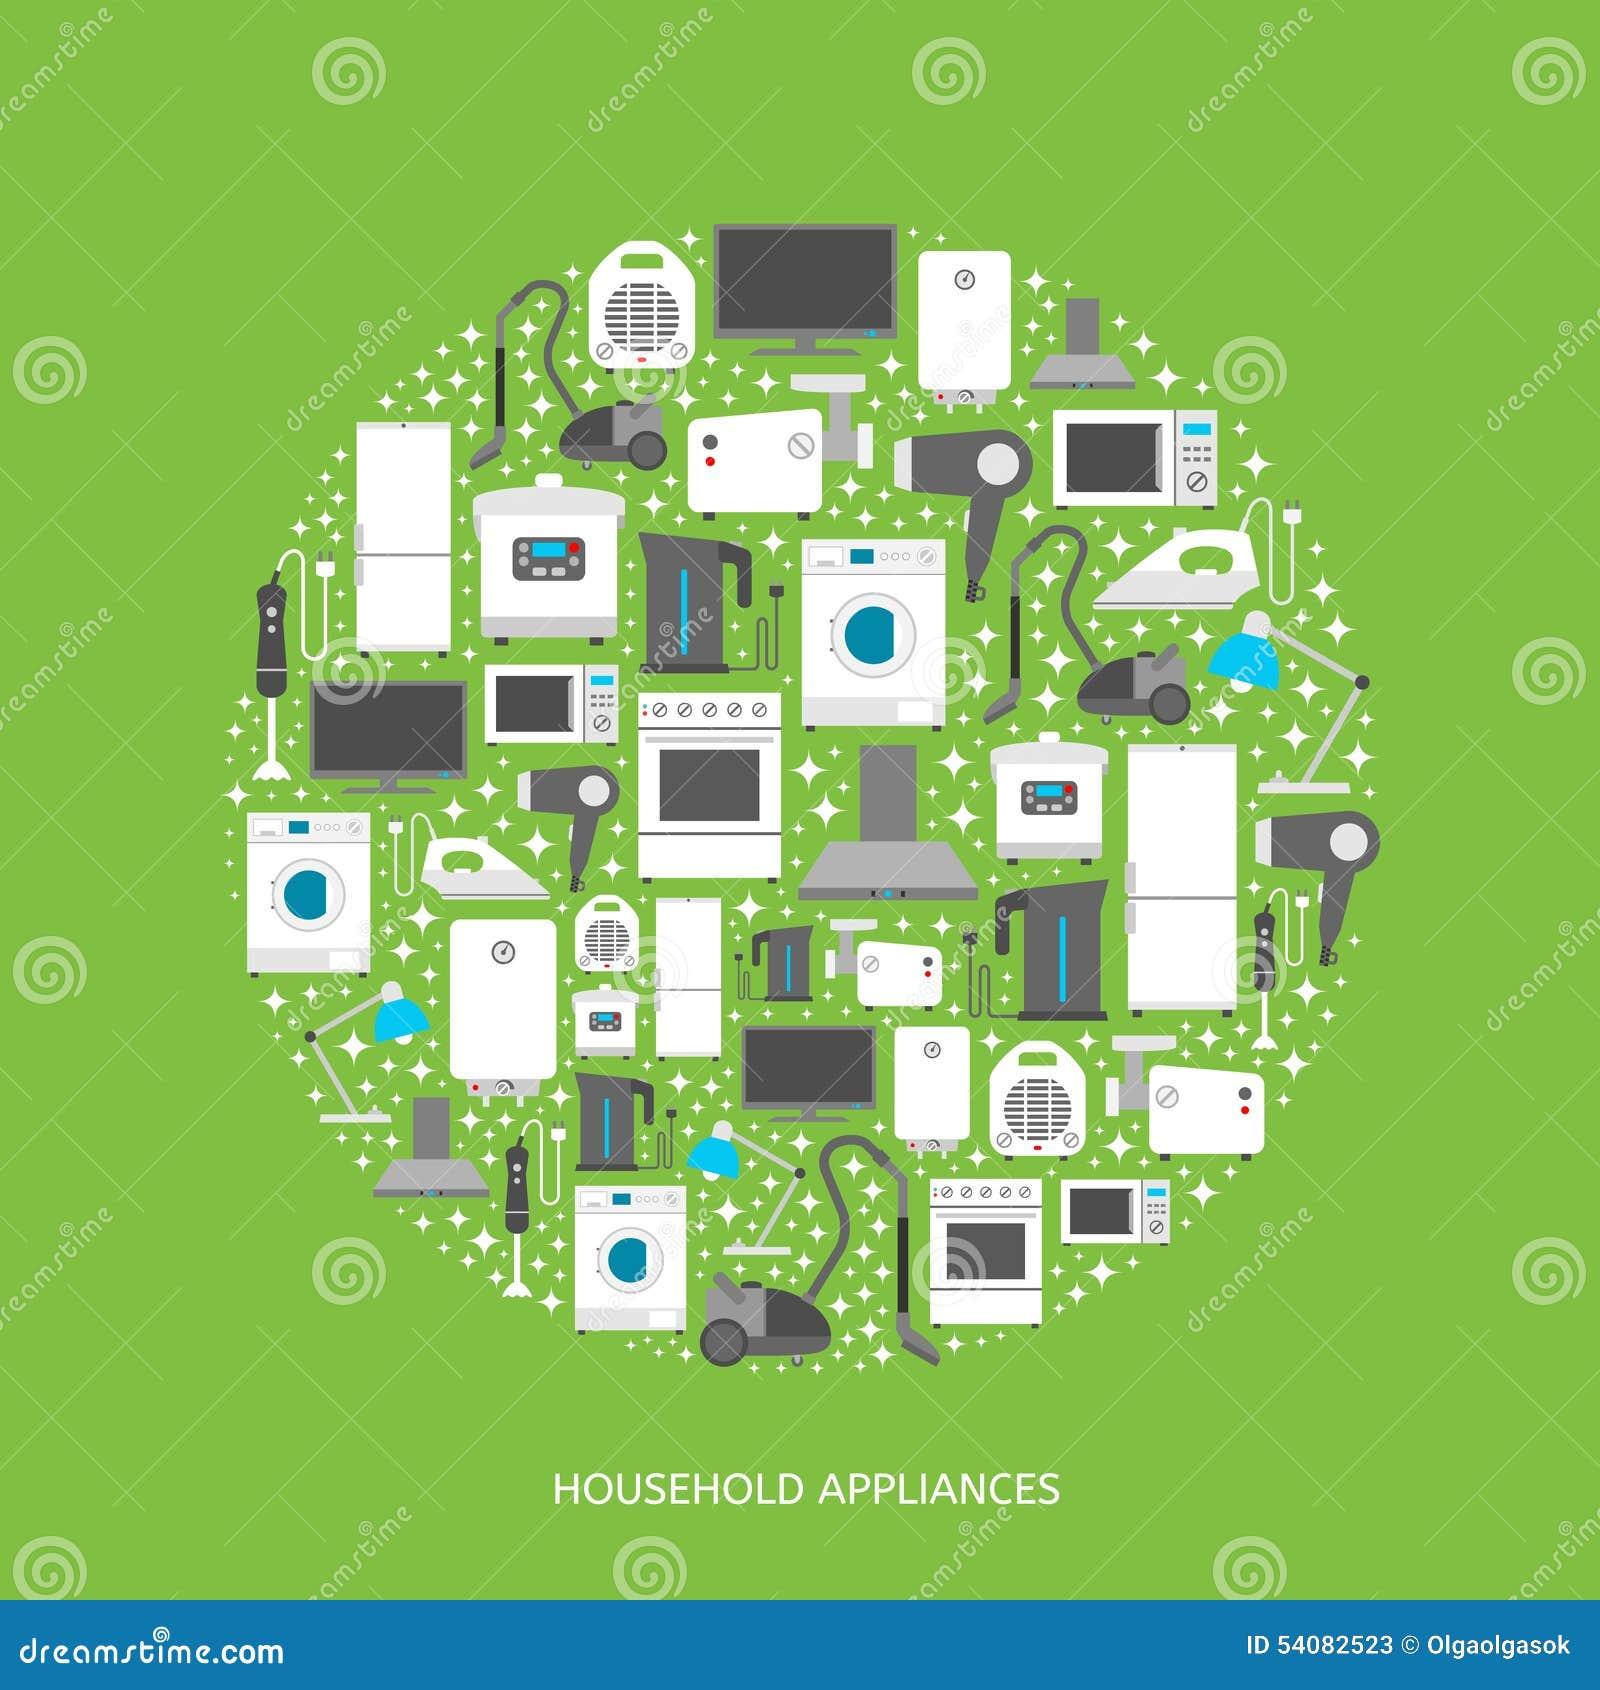 Huishoudapparaten vlakke pictogrammen